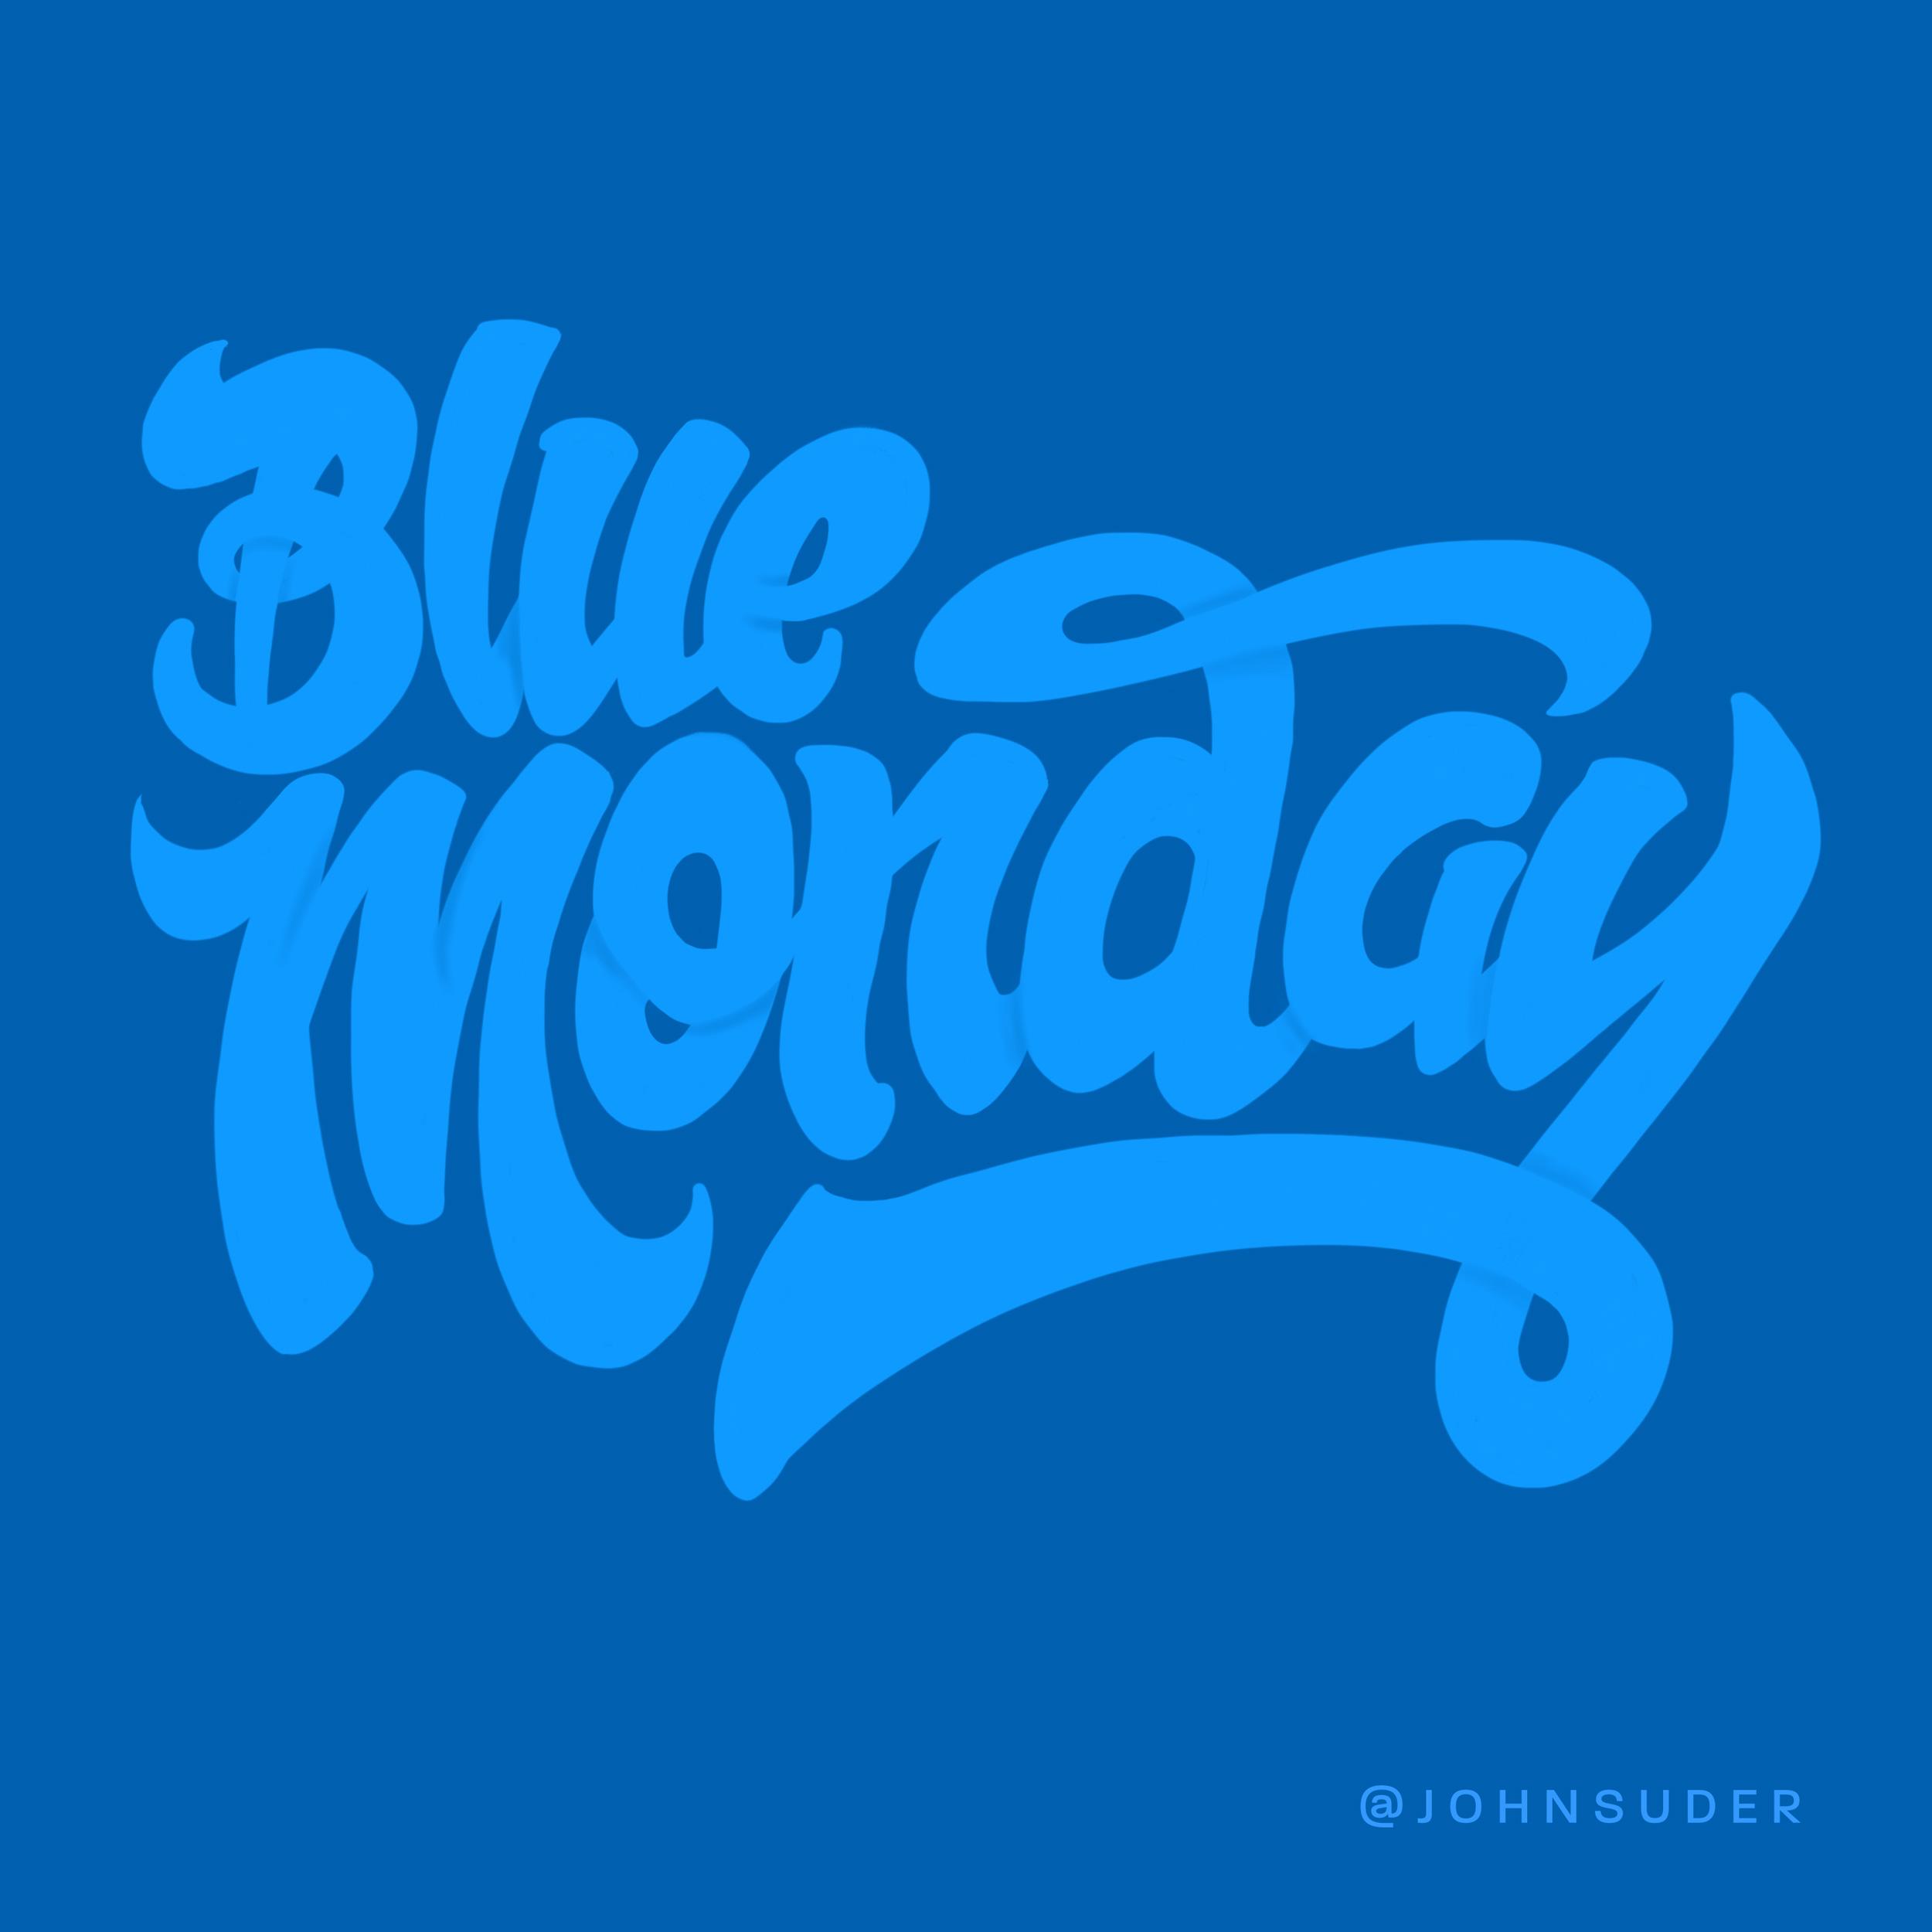 blue monday by john suder.jpg